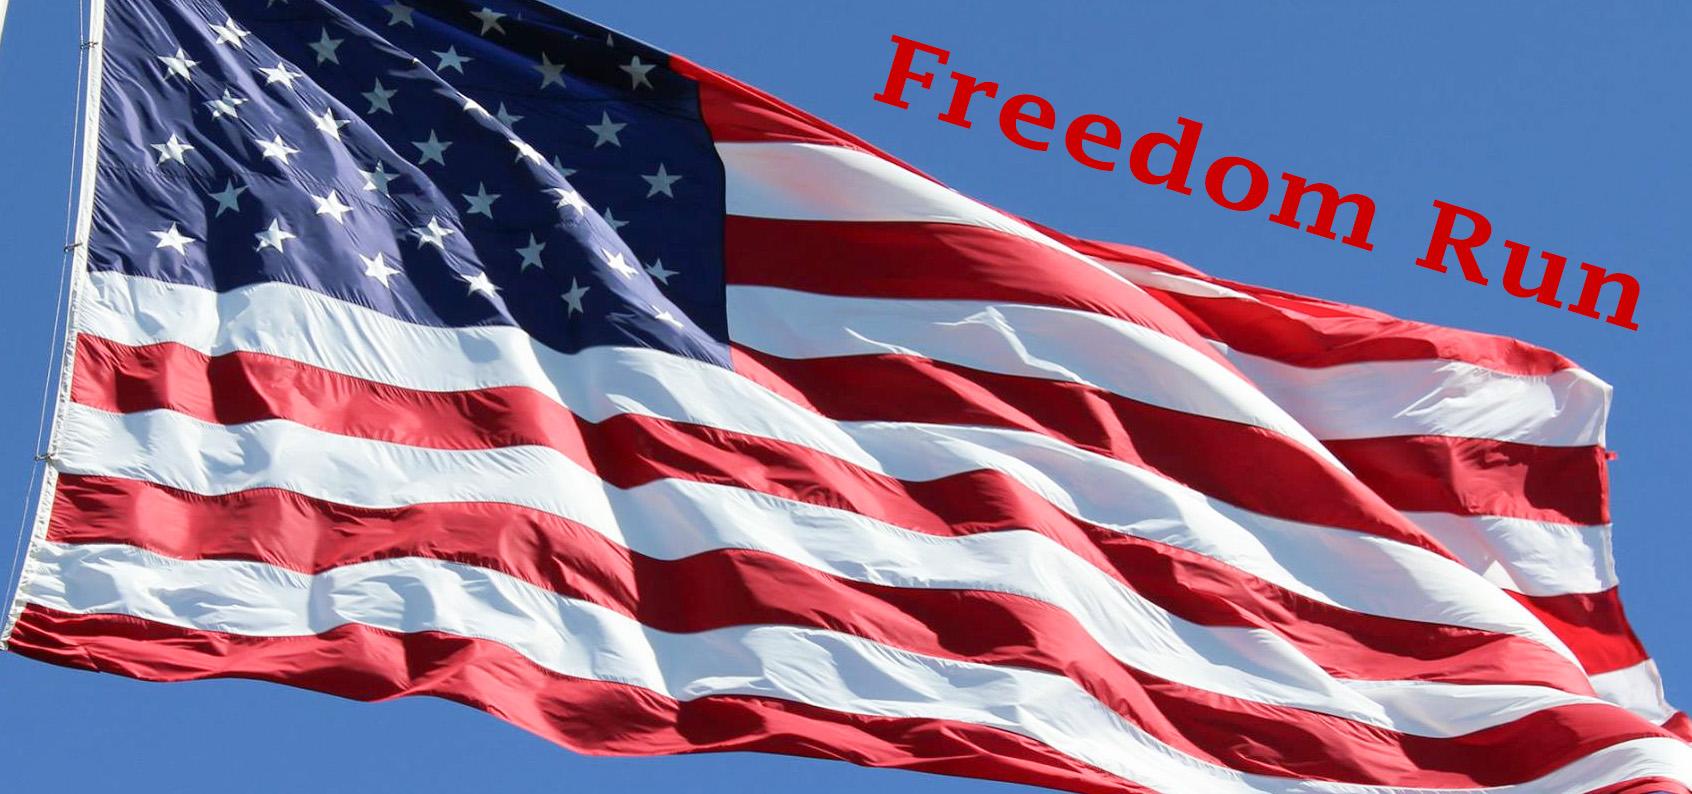 5k 4th Of July Freedom Run